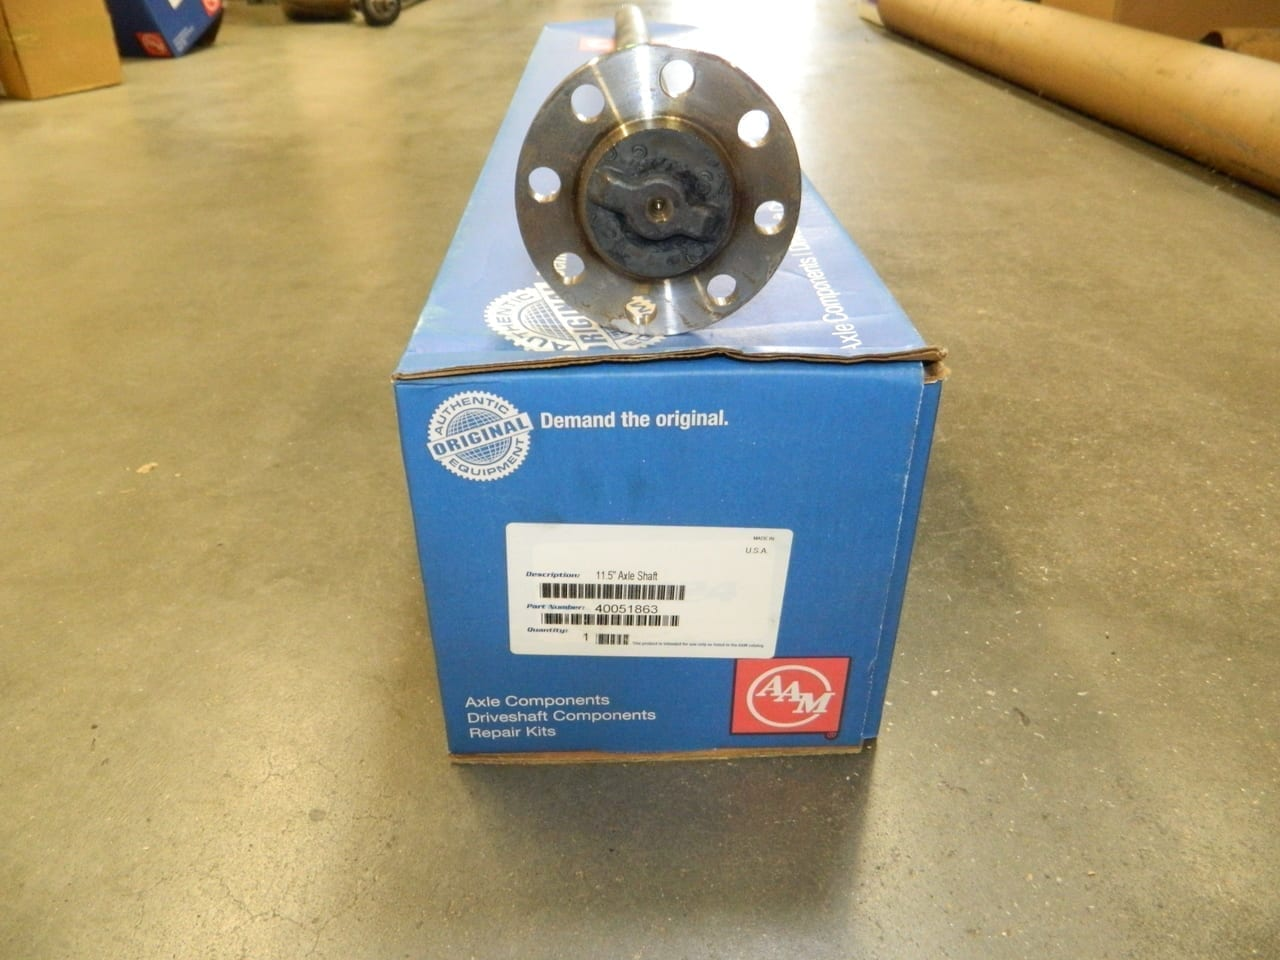 "2010-2014 Chevy GM 11.5 Rear Axle Shaft 40.2756"" 1023MM 30 Spline Dually Dual Rear Wheel"